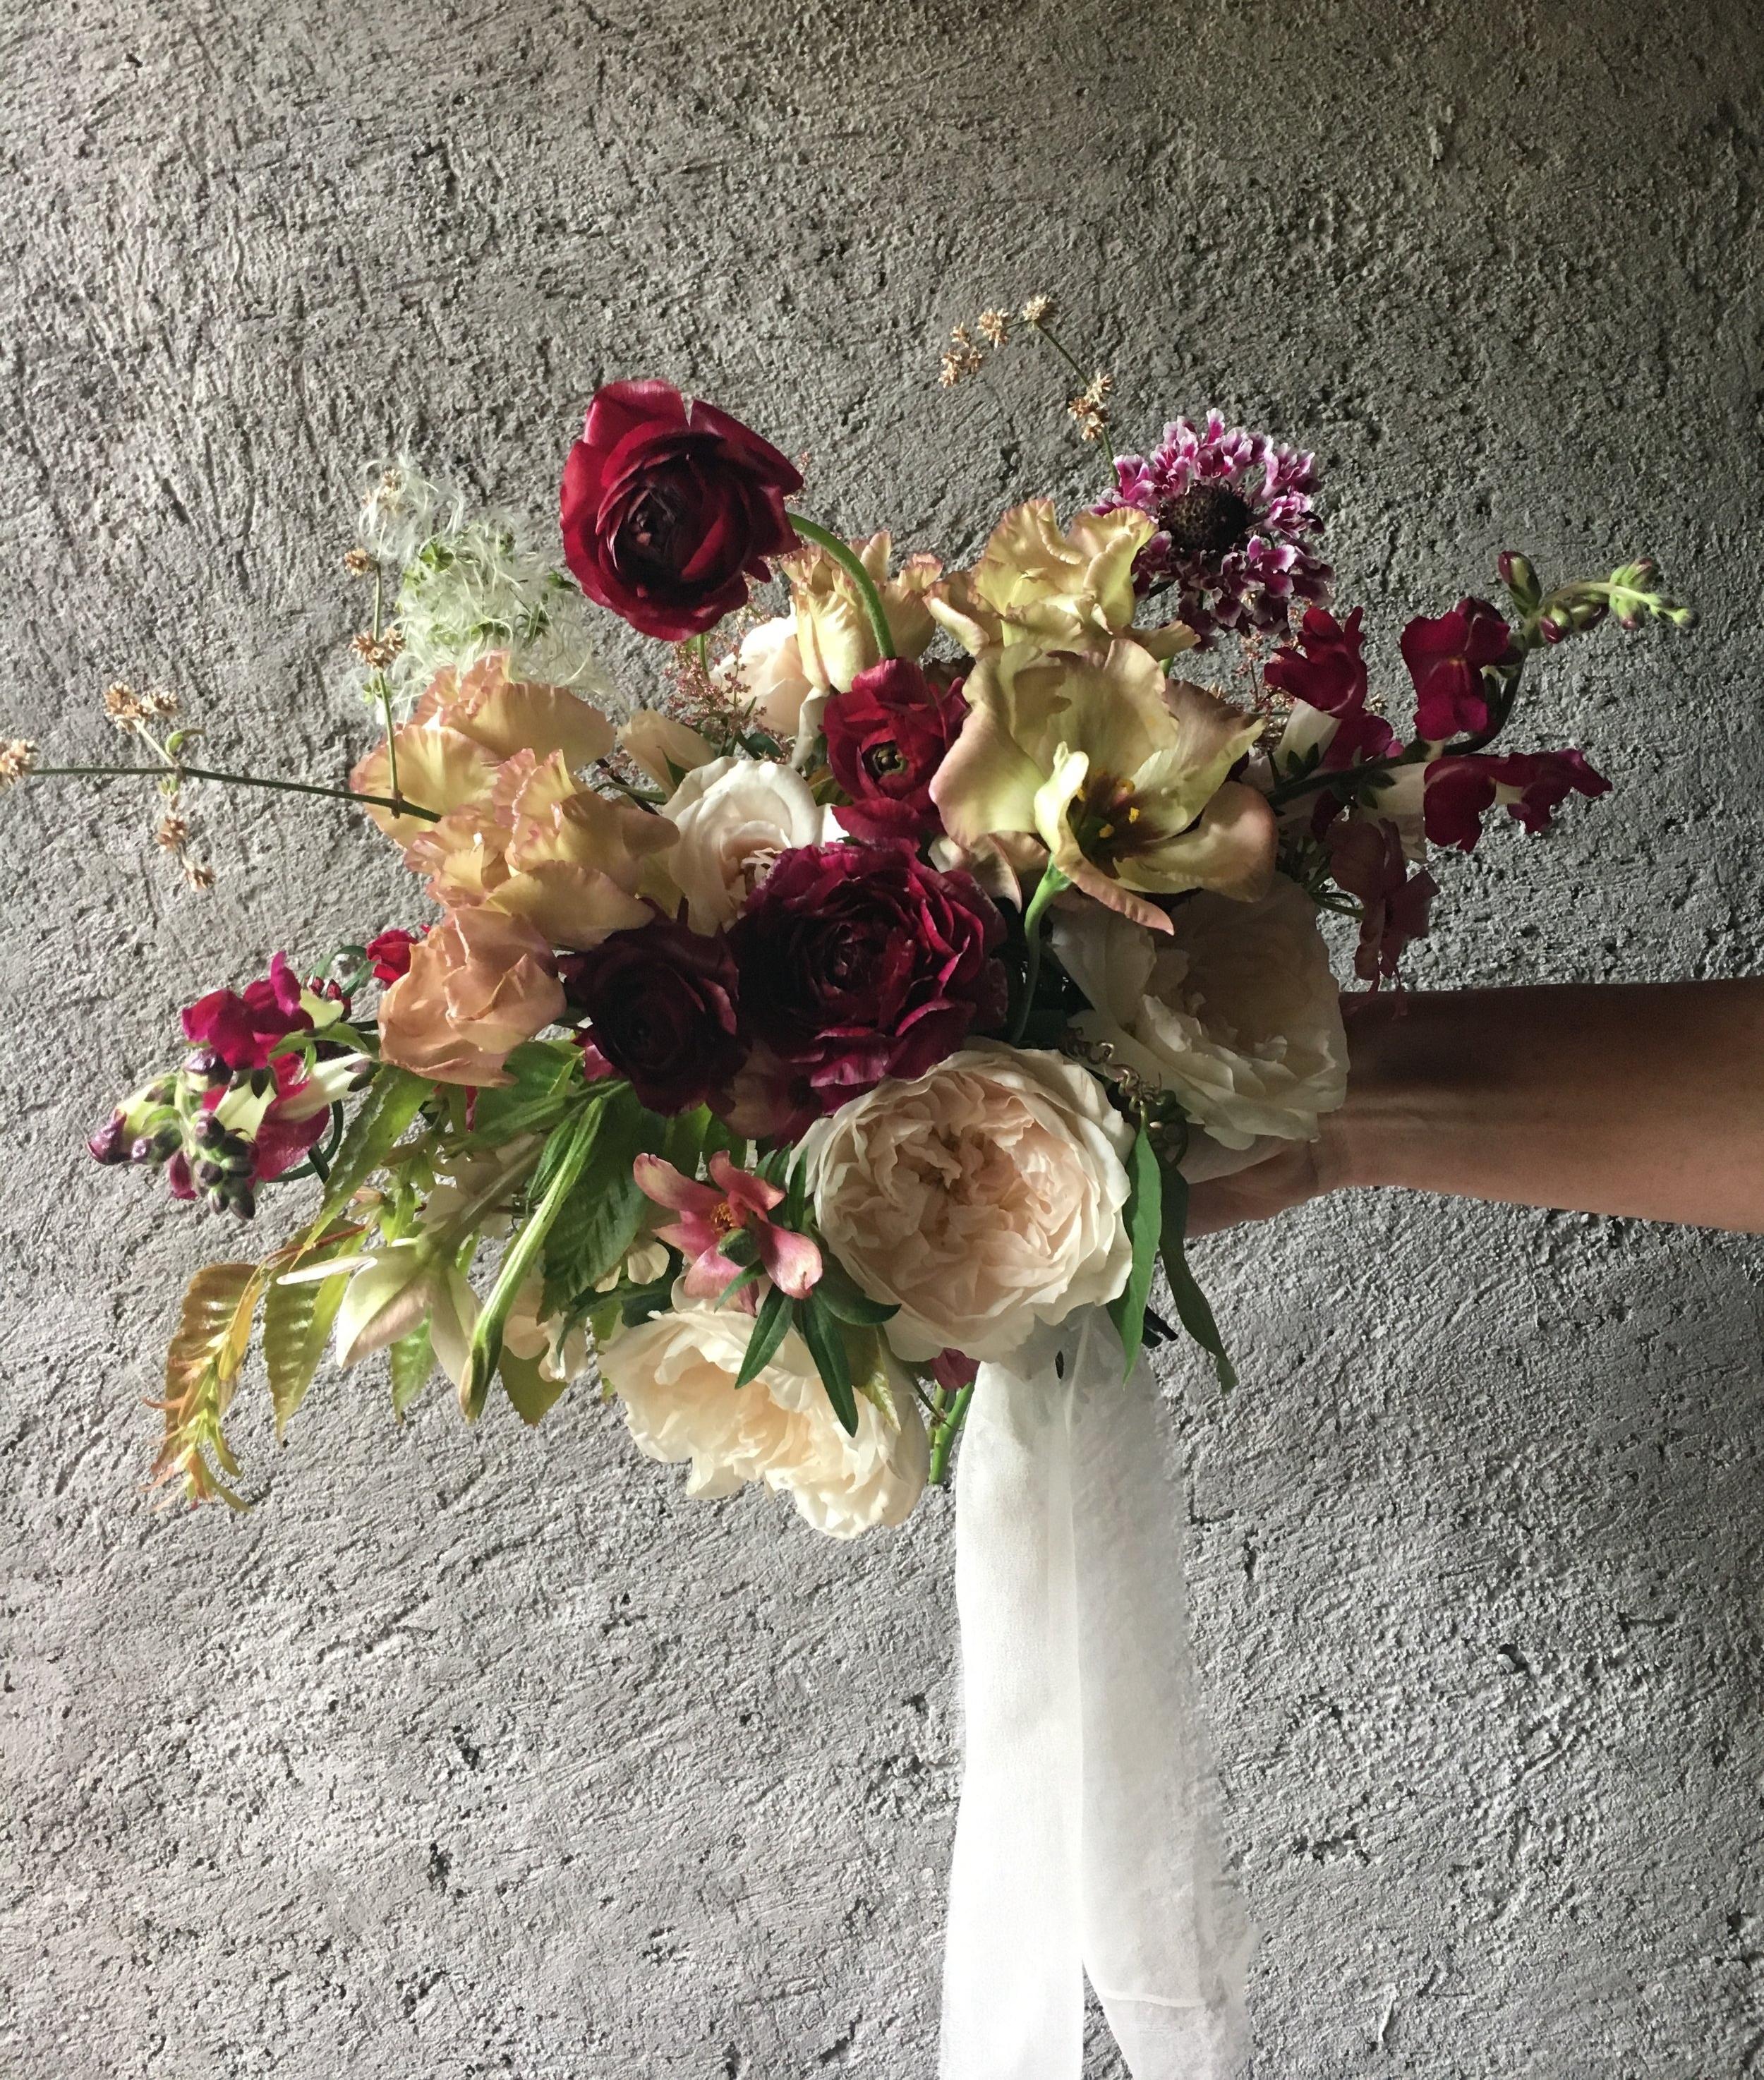 My wedding bouquet design from the workshop.